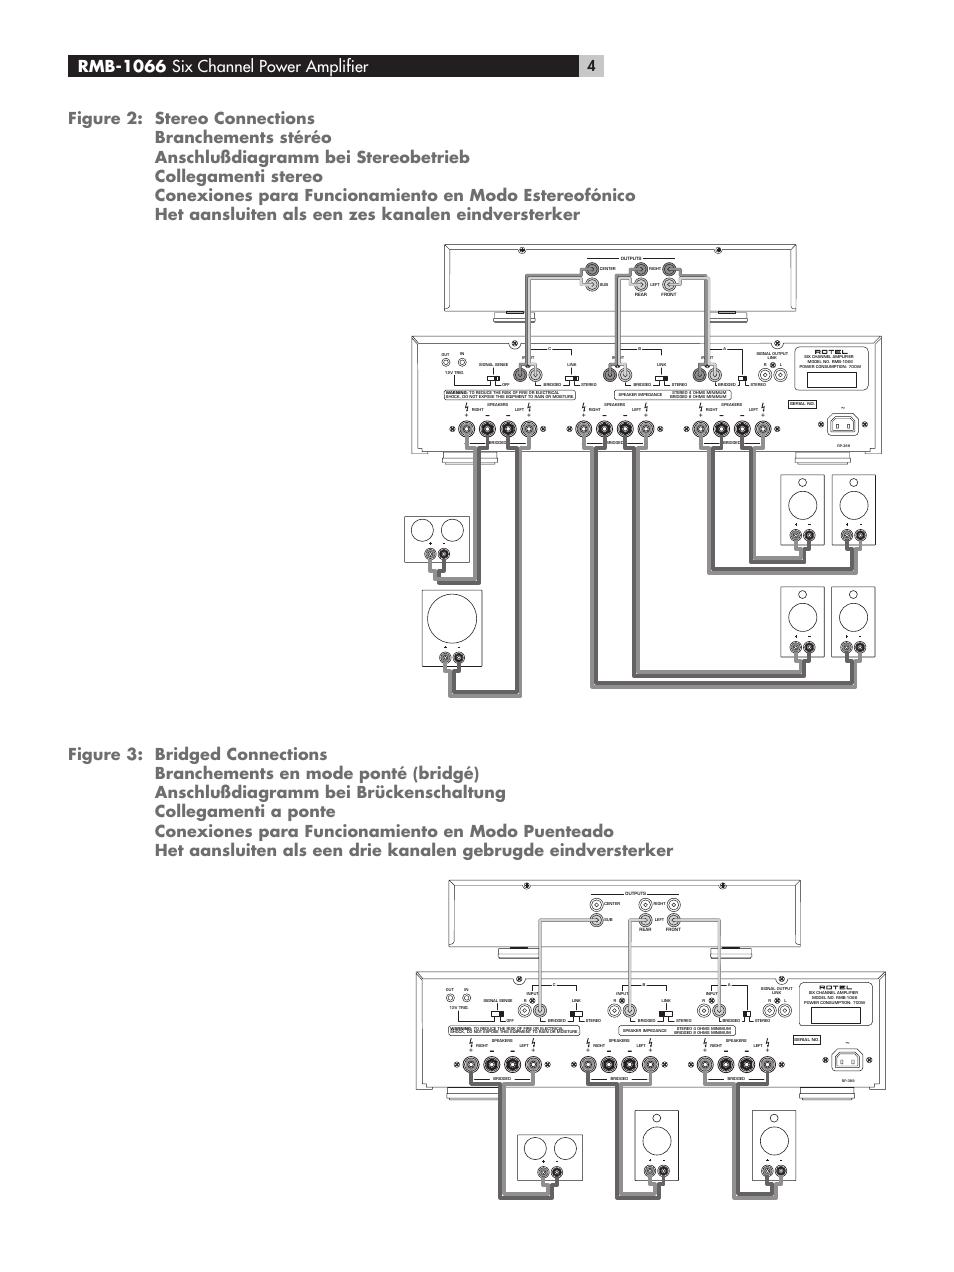 Me venden una etapa rotel rmb 1066 impoluta por 390 euros Rotel-rmb-1066-page4